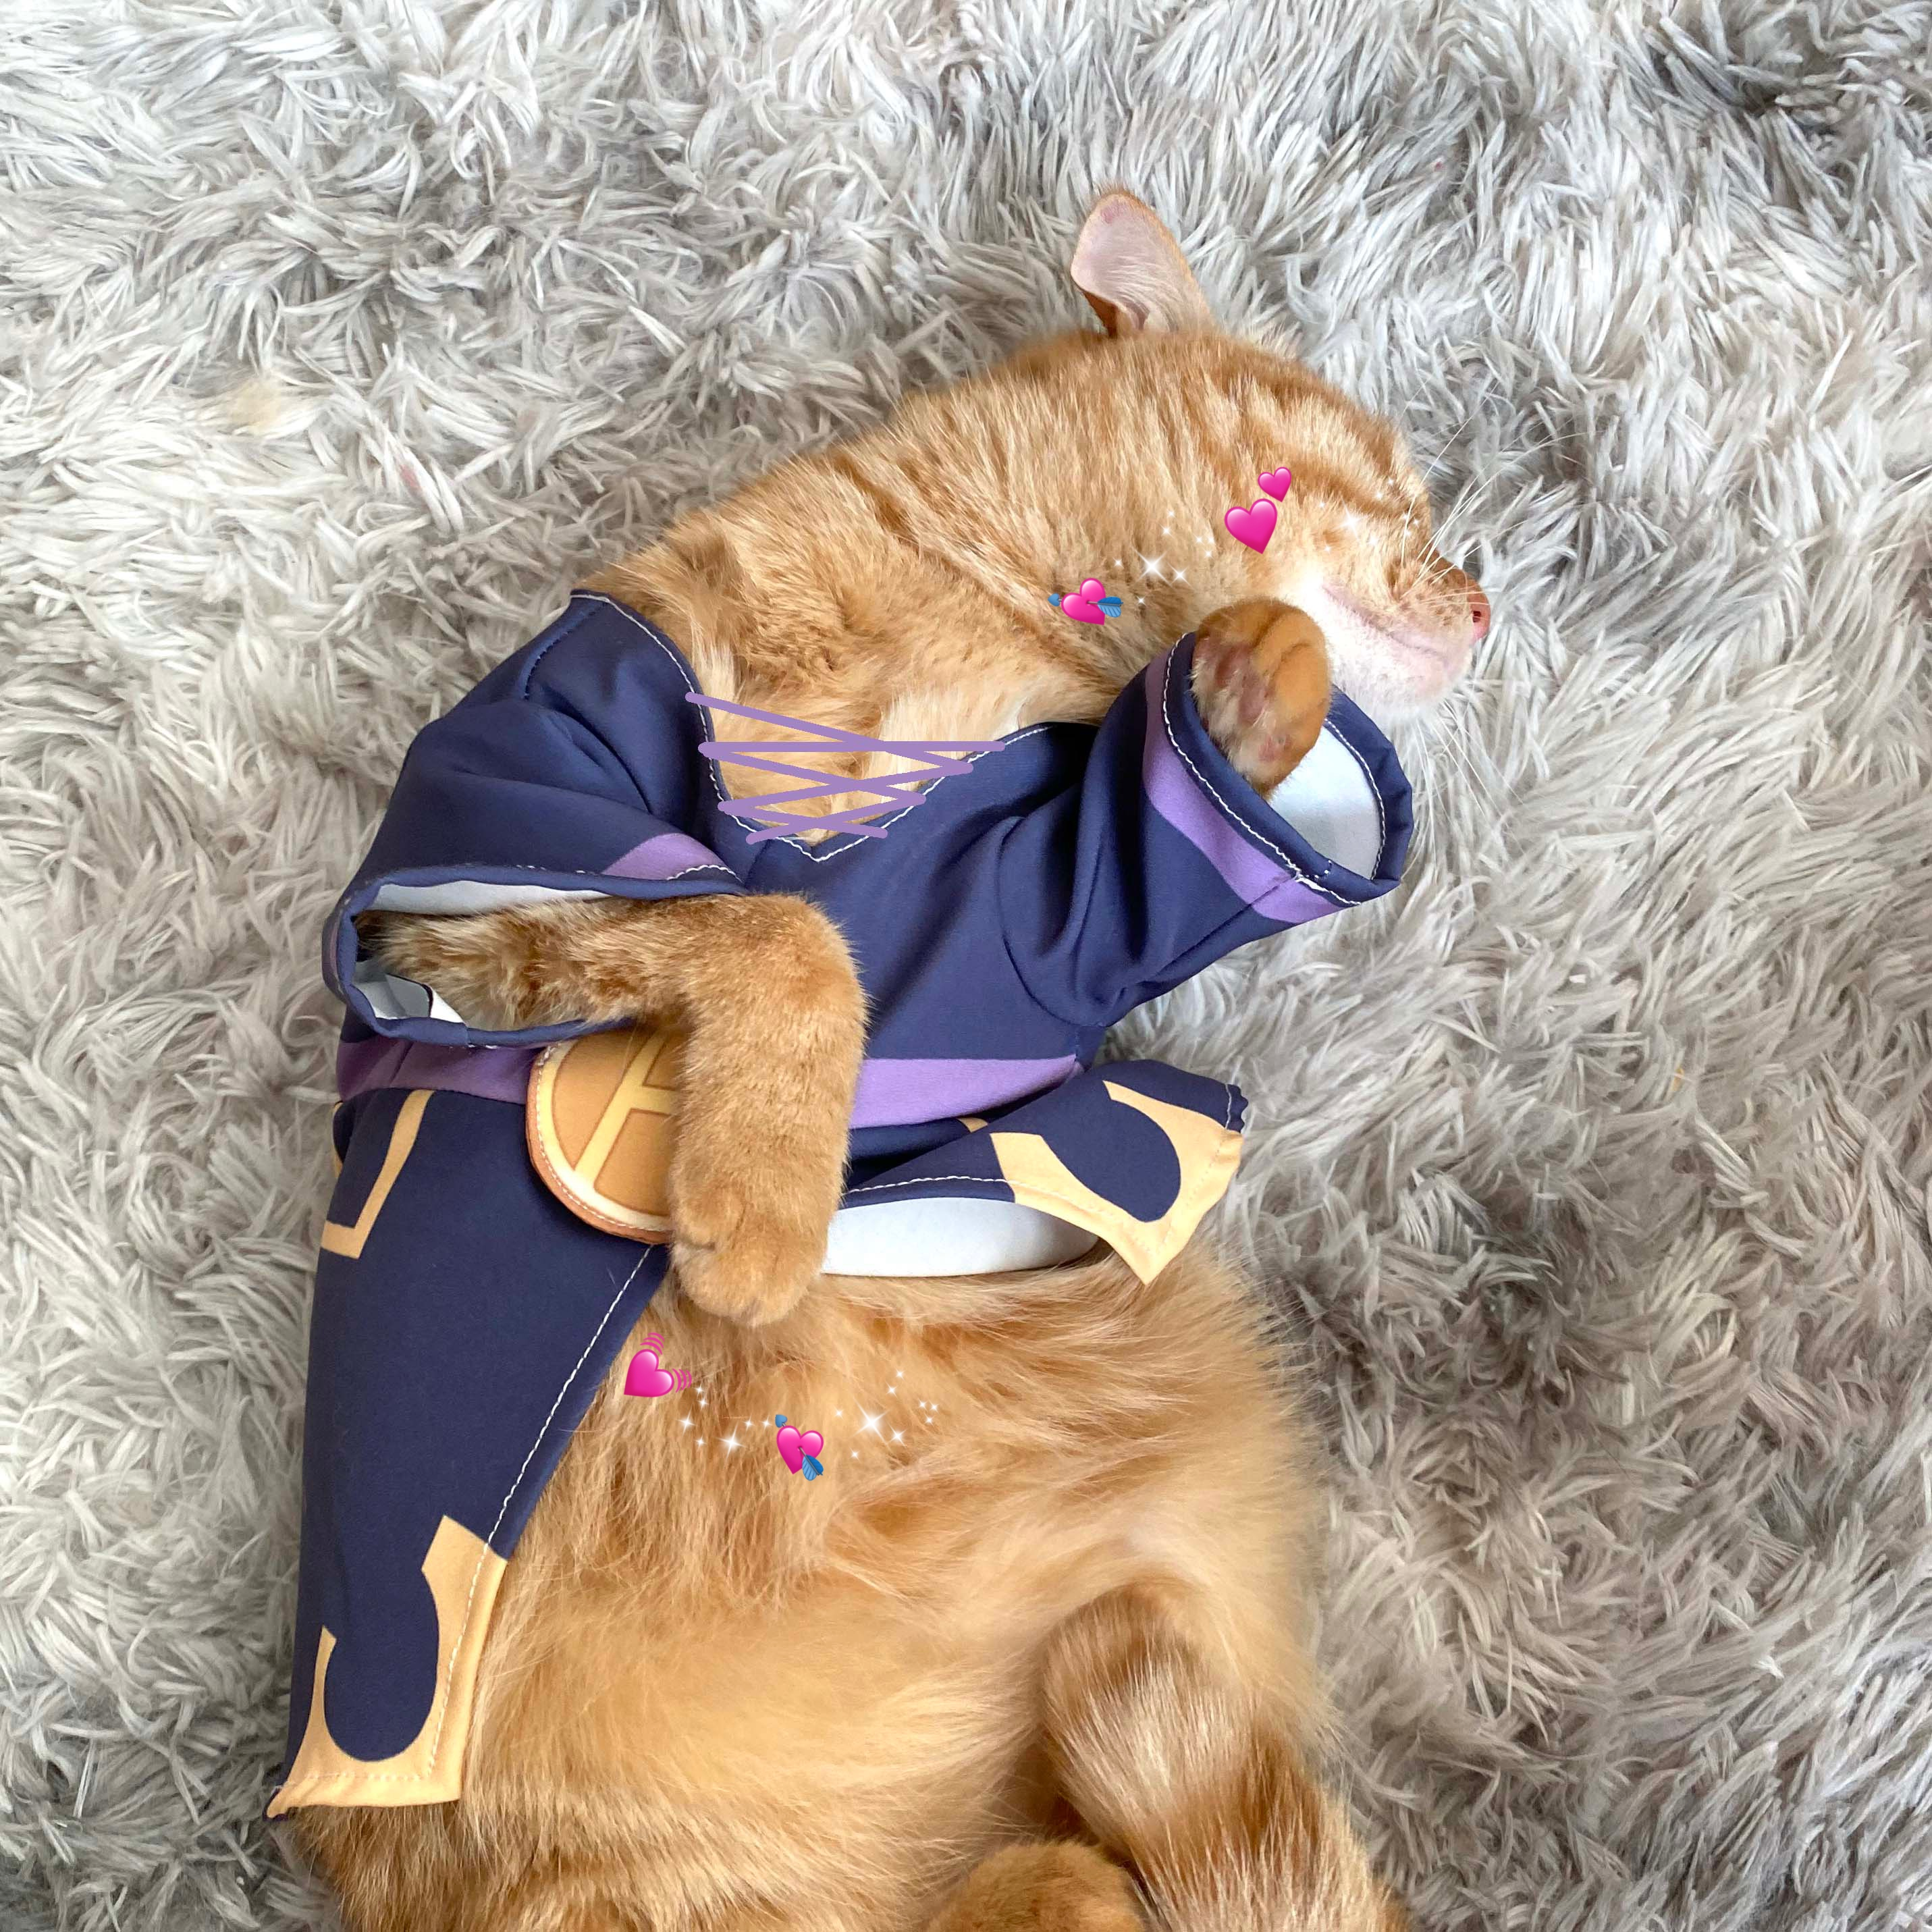 JoJo's Bizarre Adventure JOJO's Wonderful Adventure Pet Supplies Leo Apaki Cat Clothes Tea Brother Small Dog Costume Dress Up